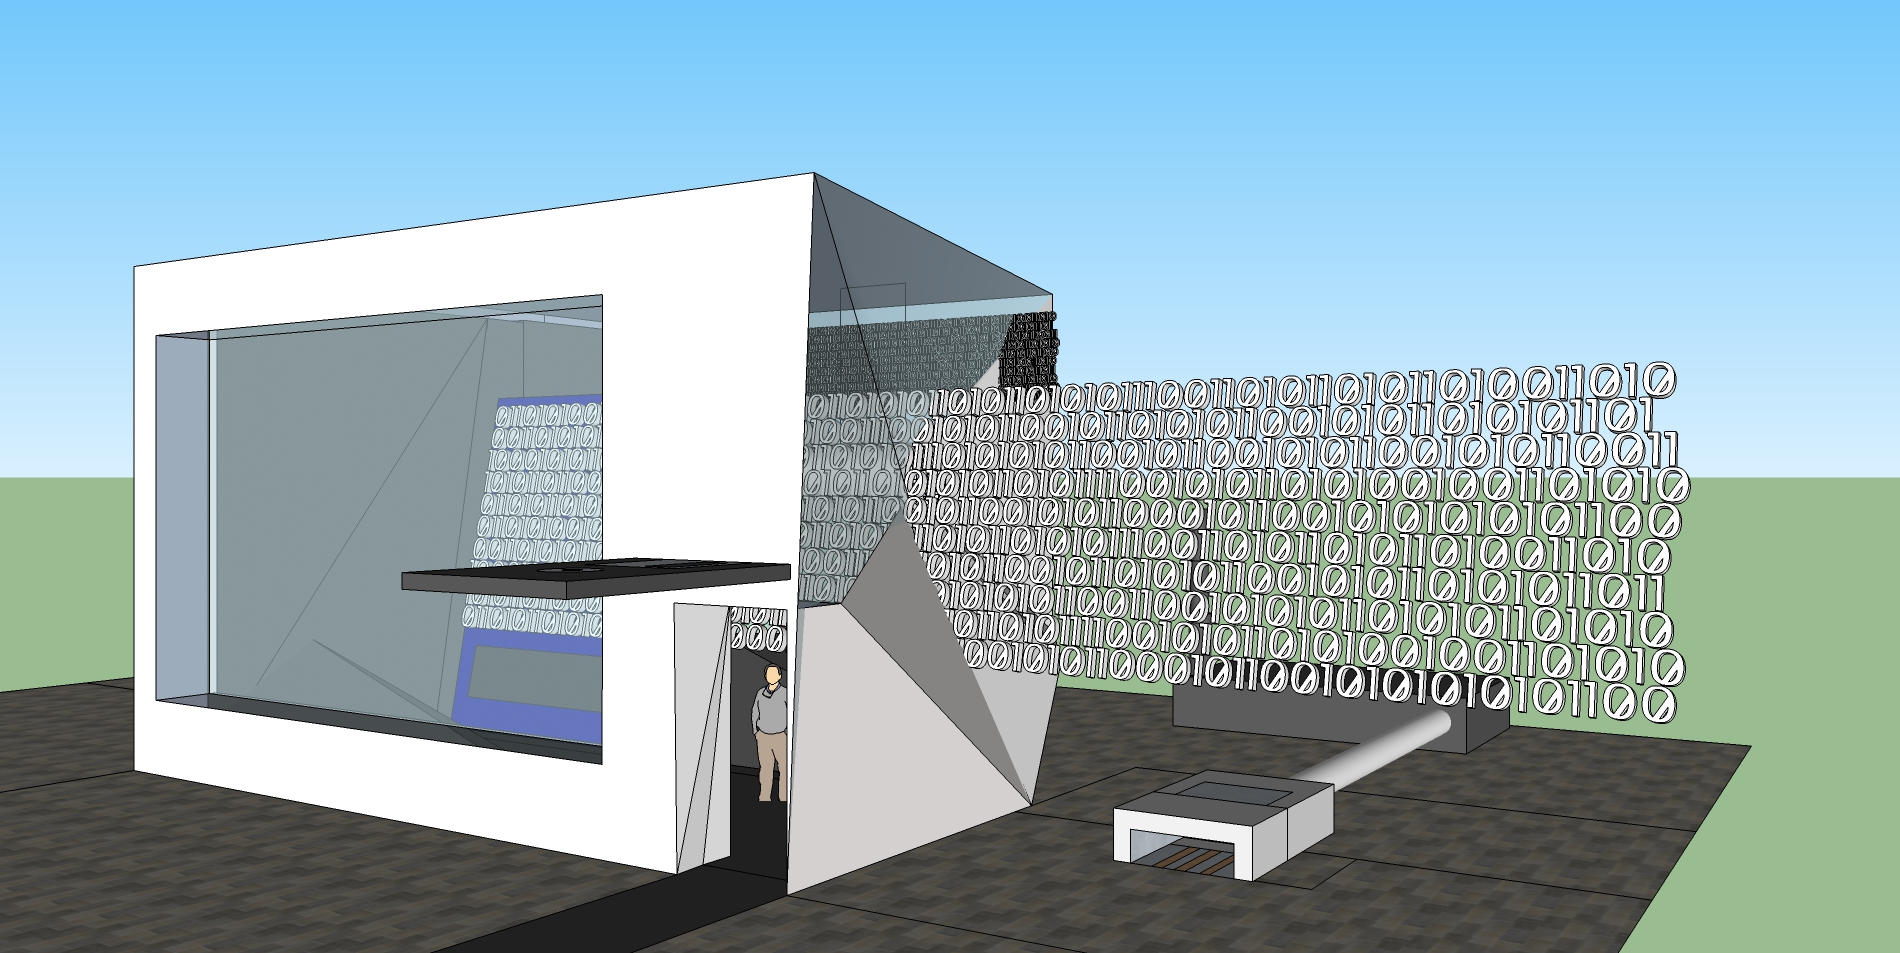 Internet Memorial 3D Proposal #6